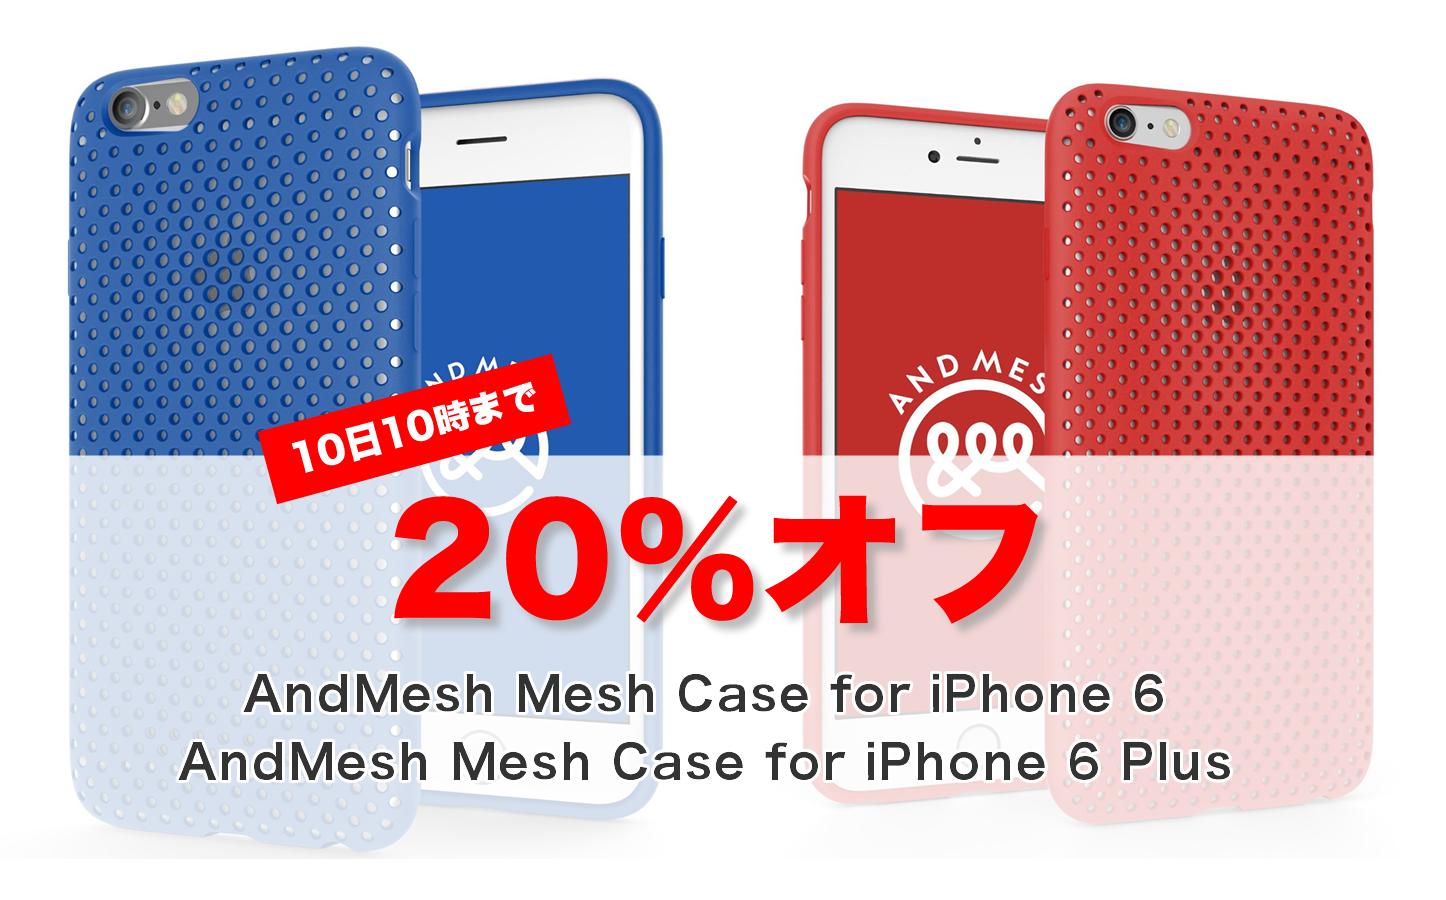 AndMesh Mesh Case Sale